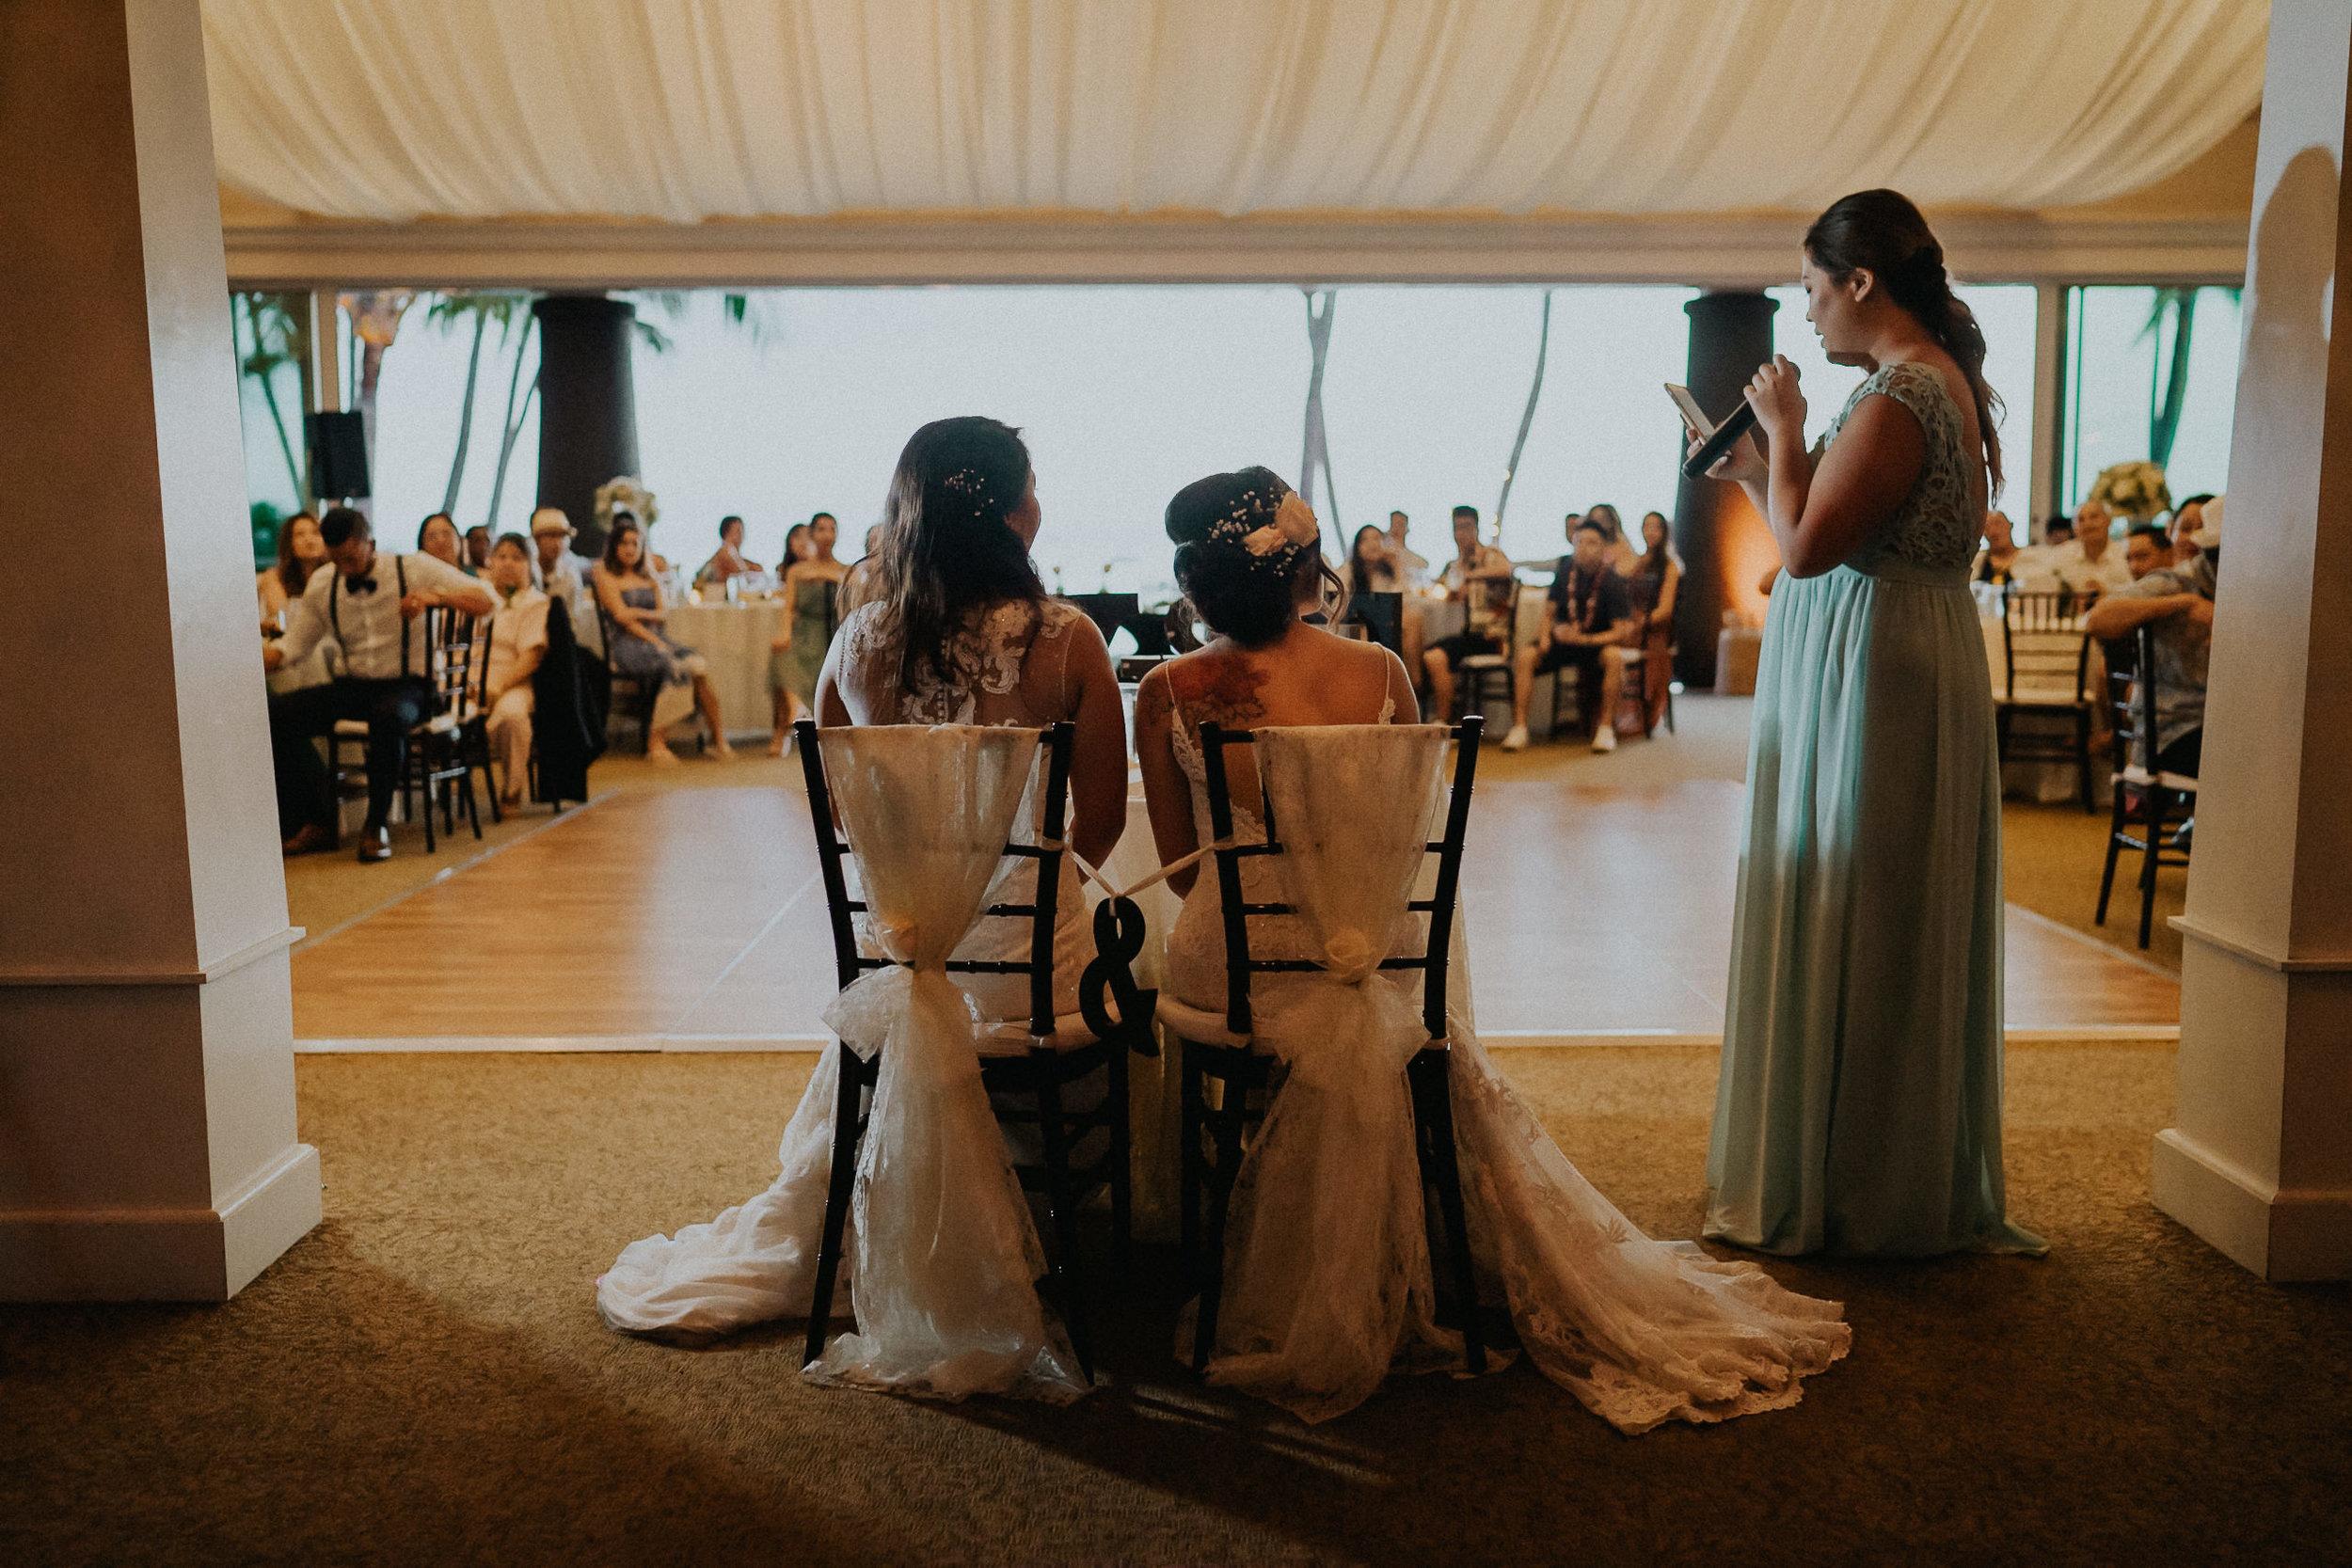 Maui_Destination_wedding_Alfred_Tang-59.jpg